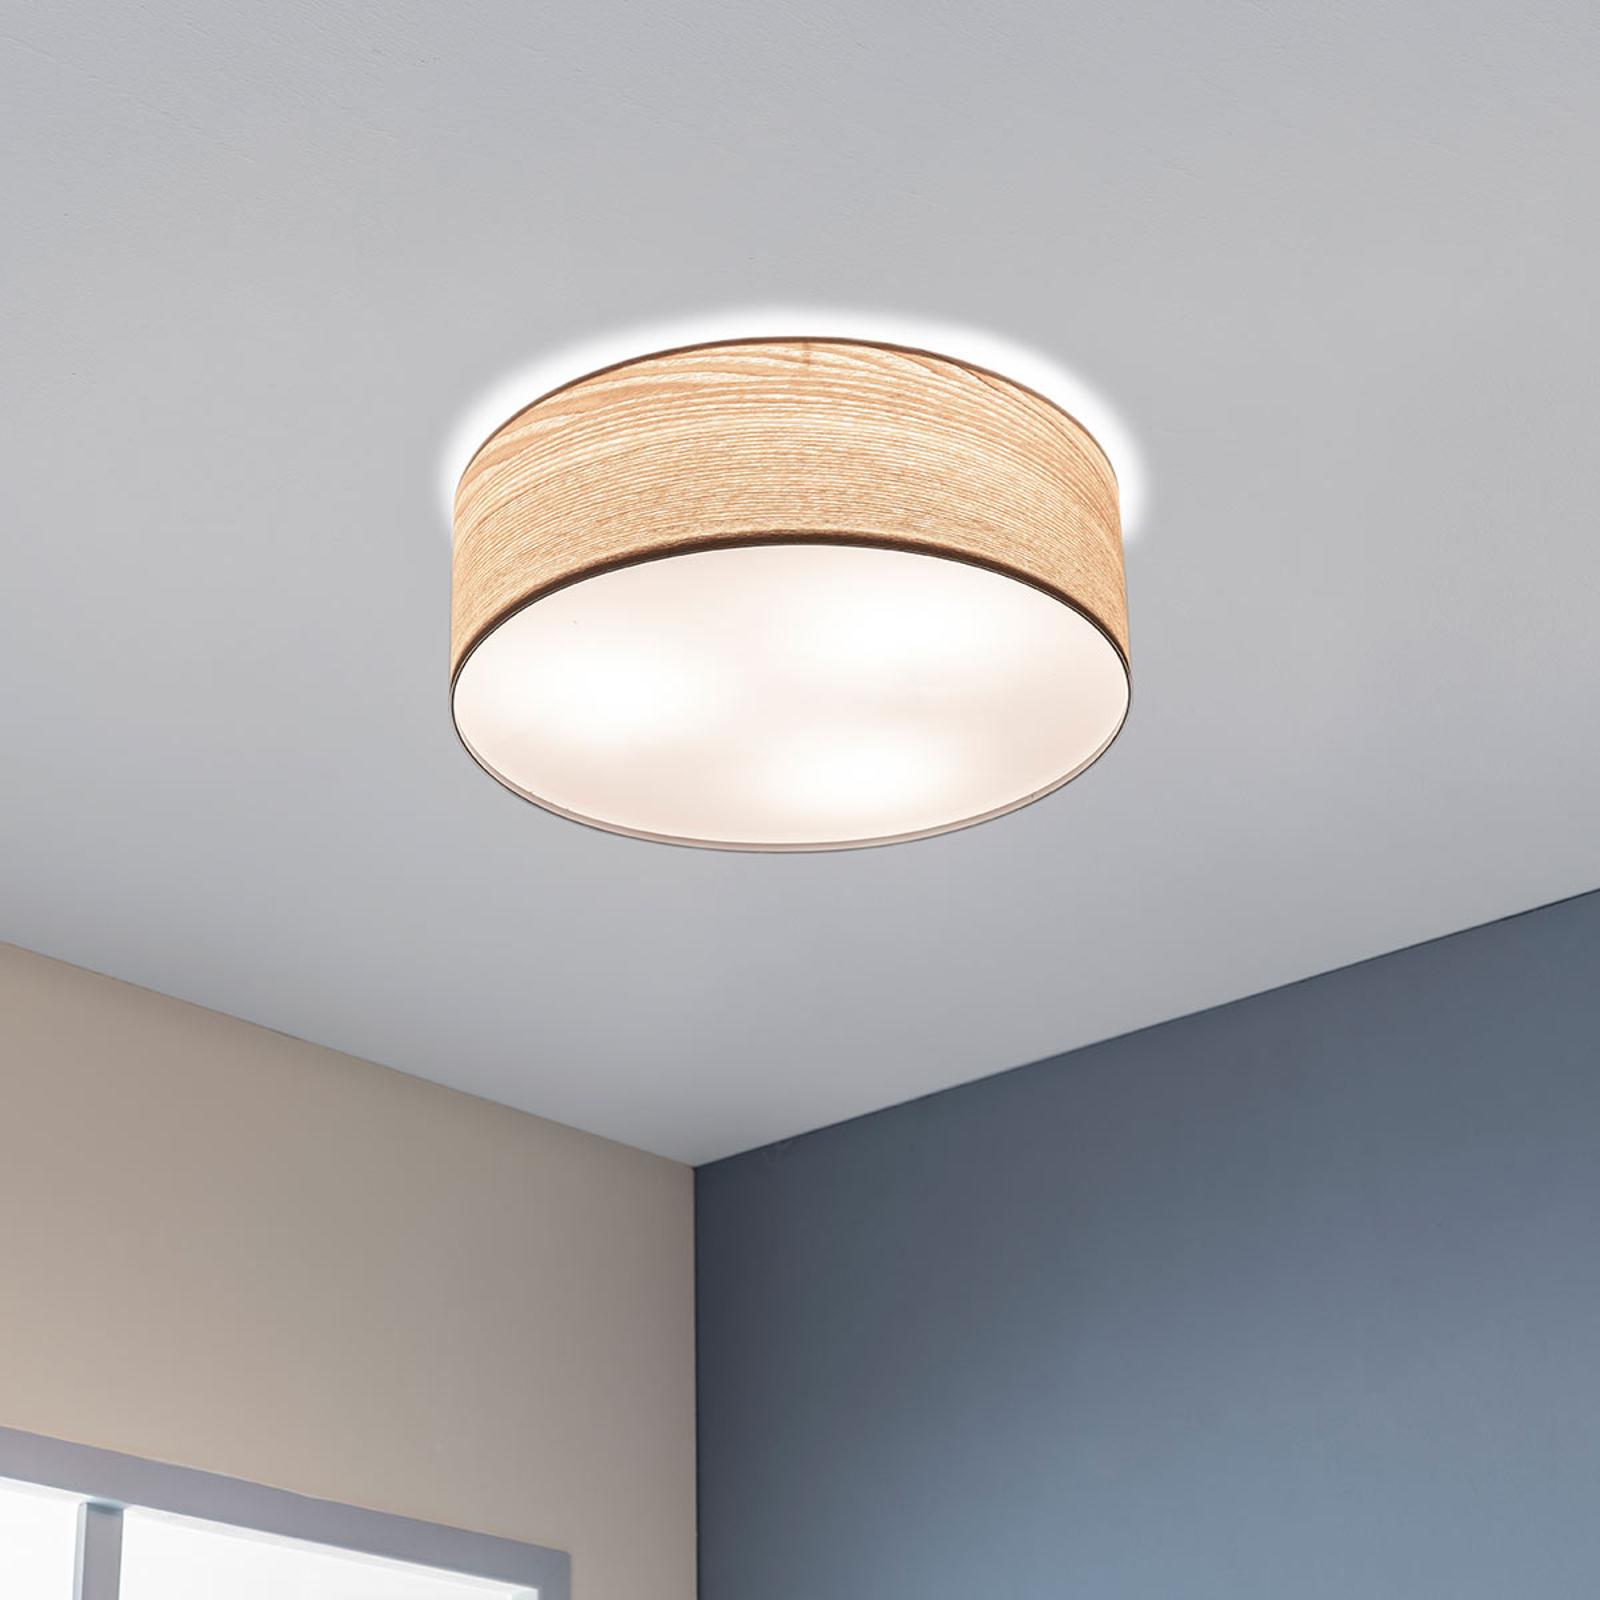 Paulmann Liska Deckenlampe in hellem Holz